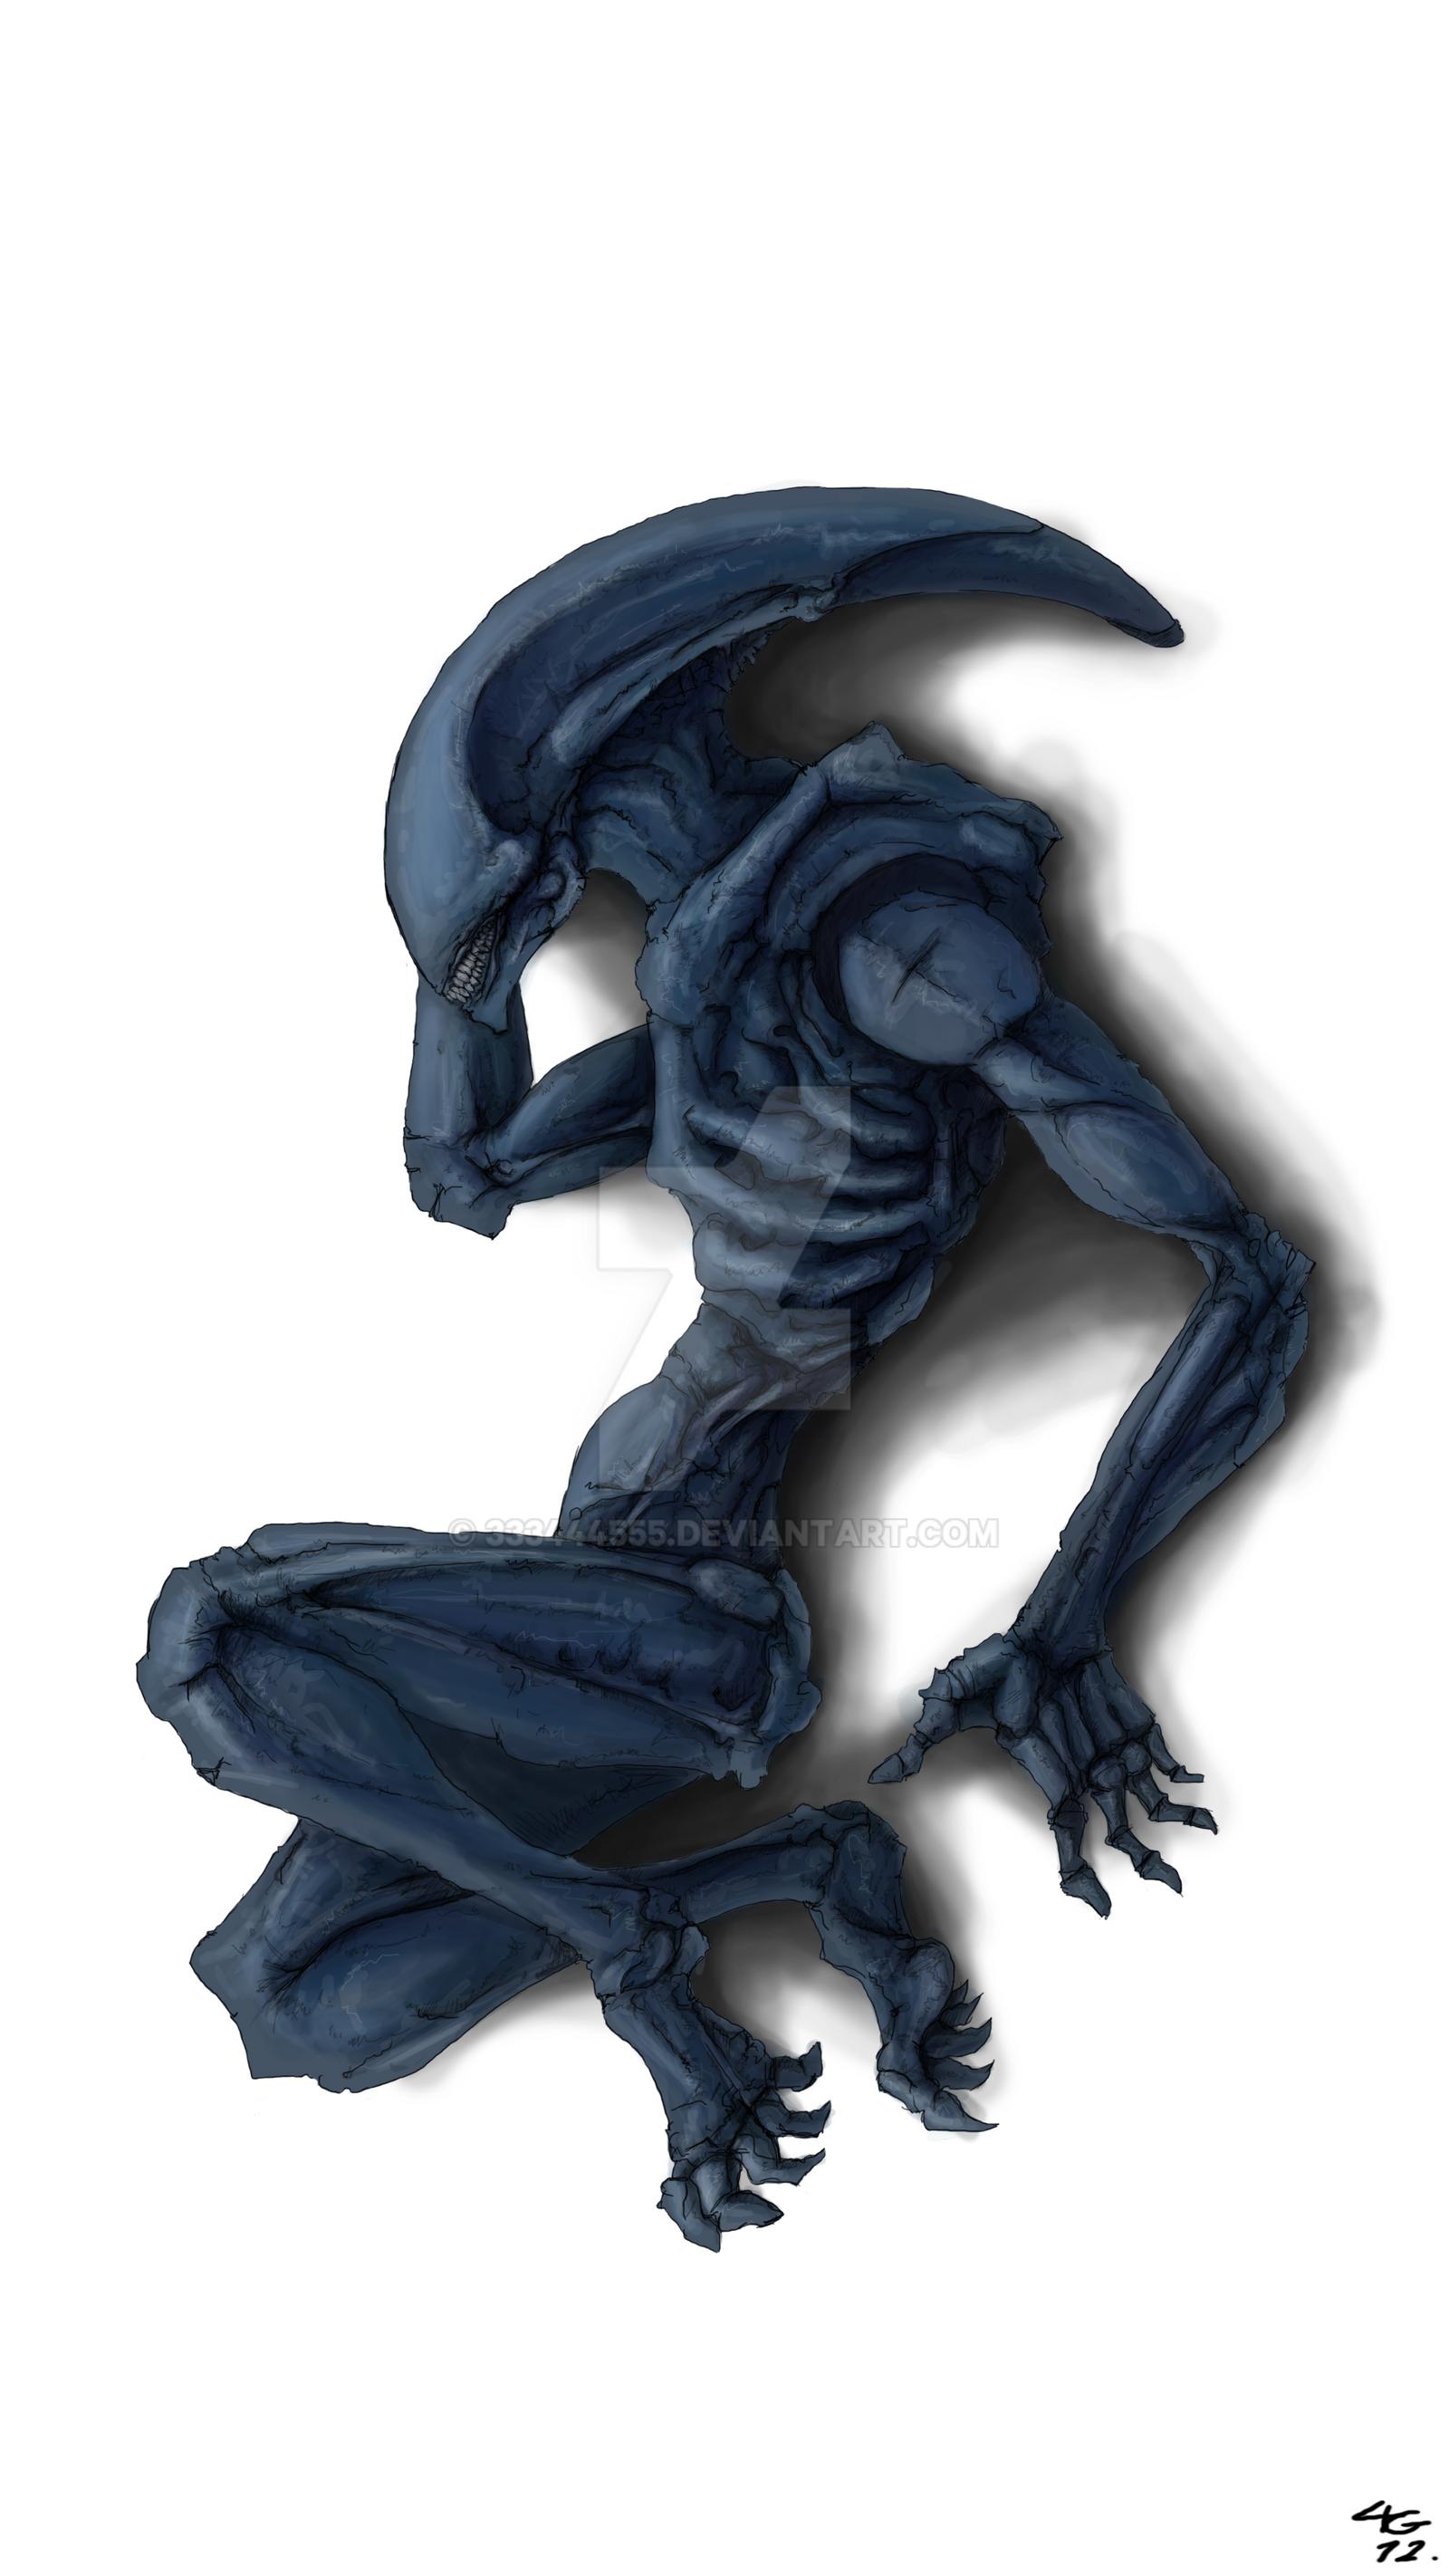 prometheus proto alien by 333444555